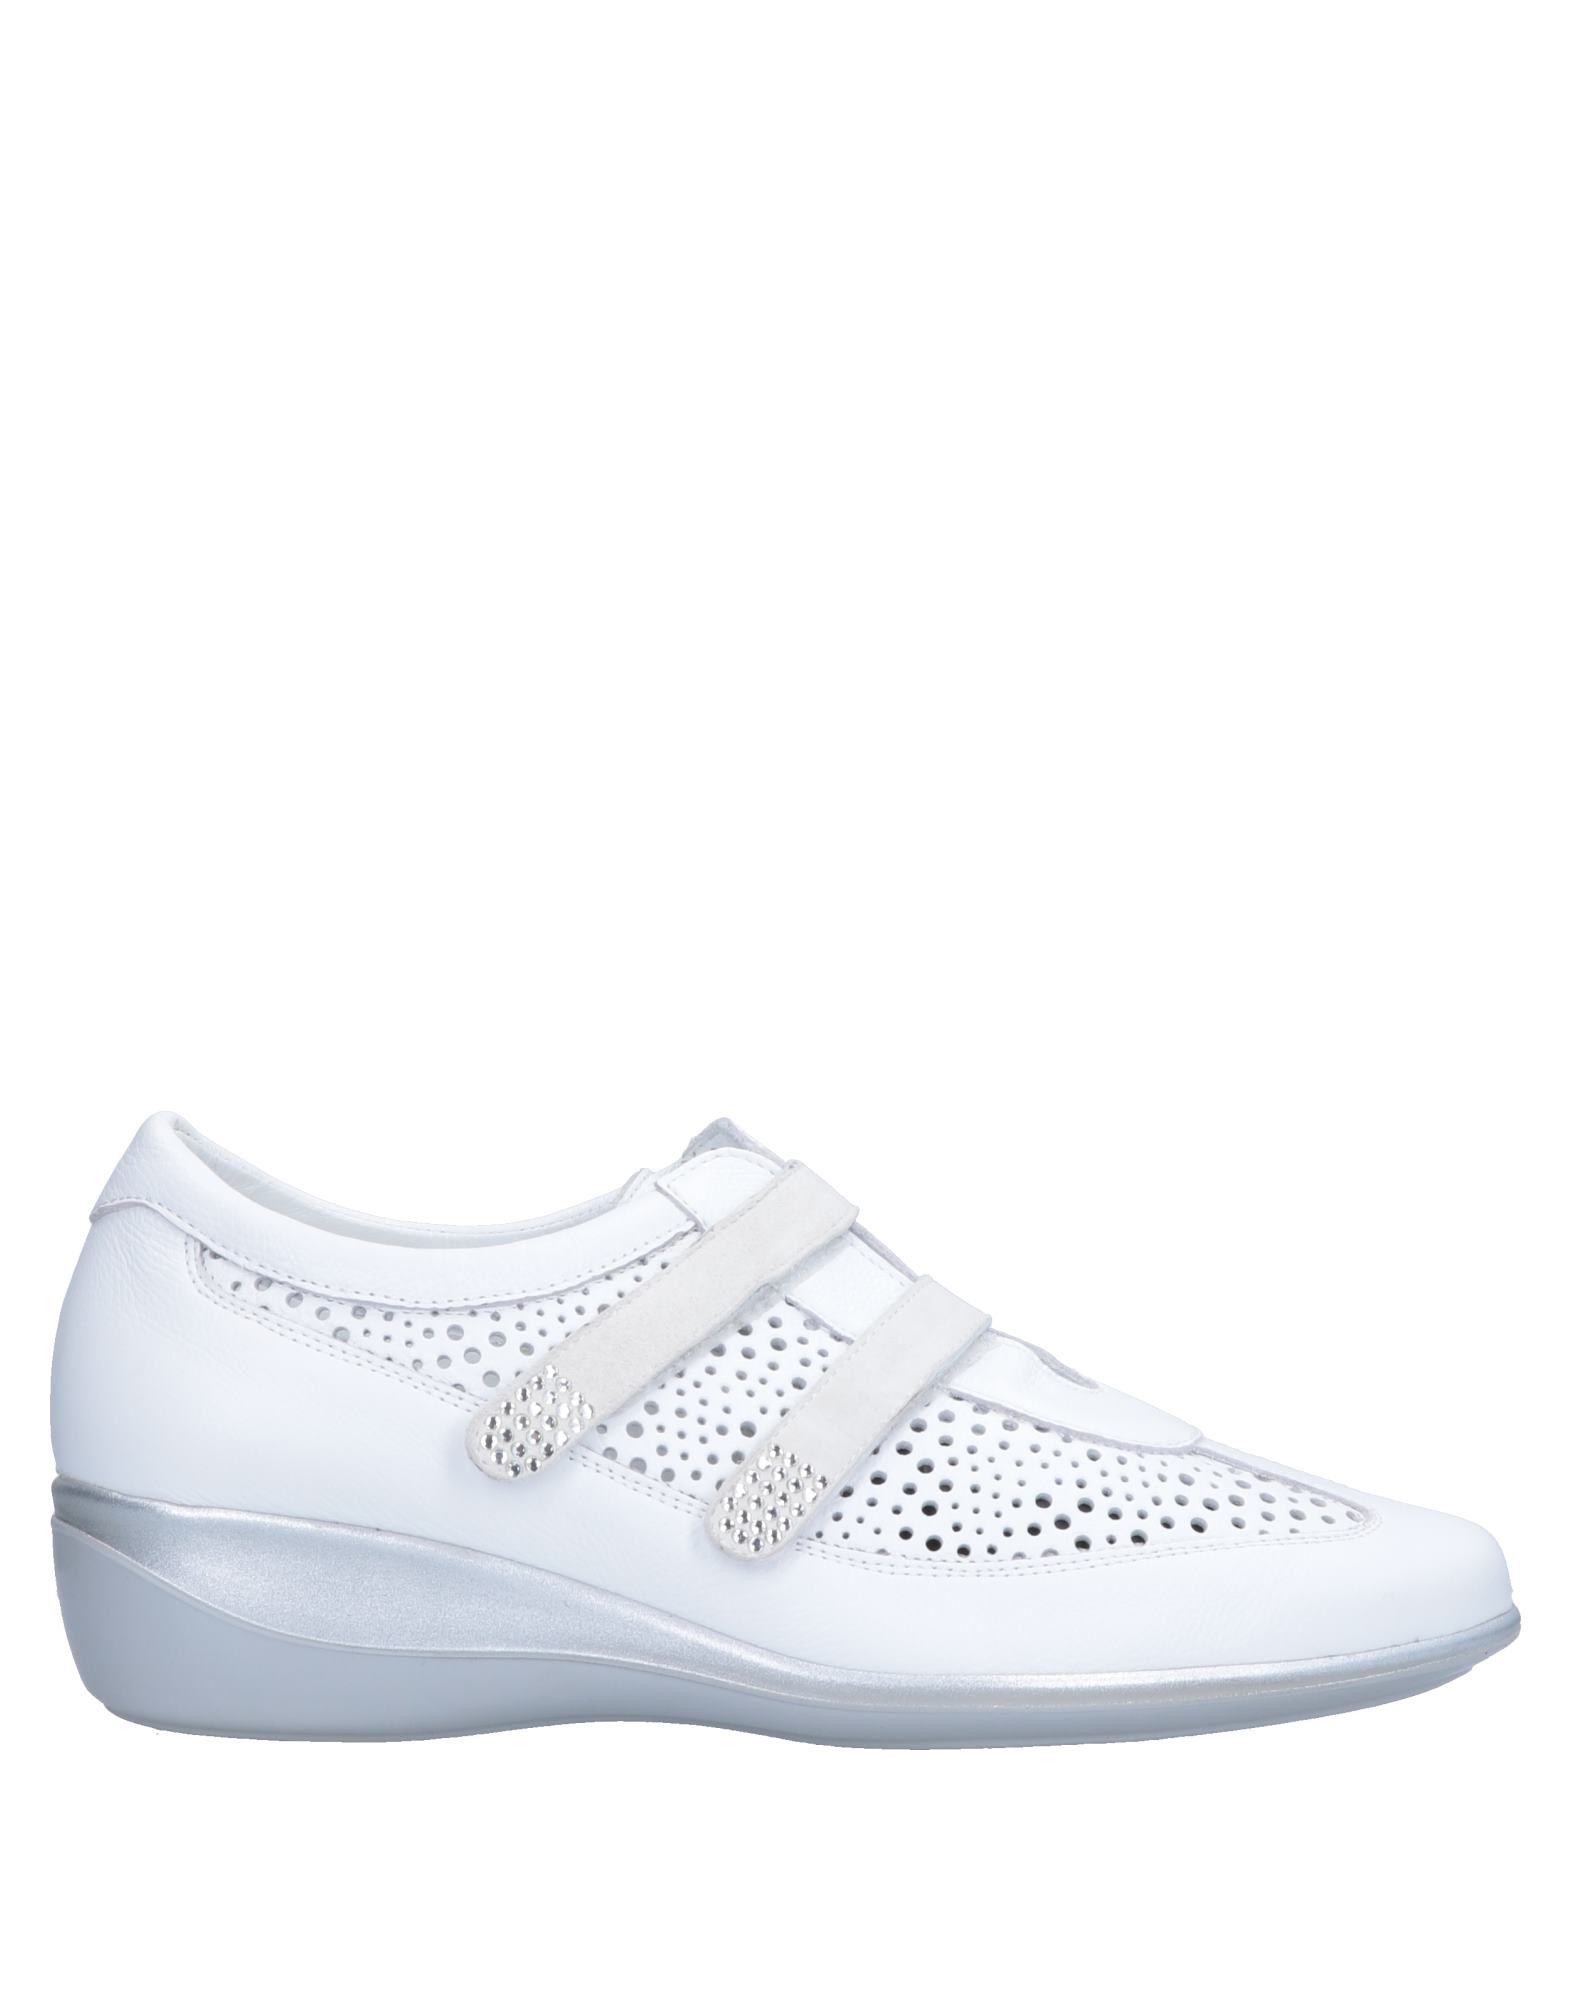 Valleverde Gute Sneakers Damen  11547359AG Gute Valleverde Qualität beliebte Schuhe cfff78